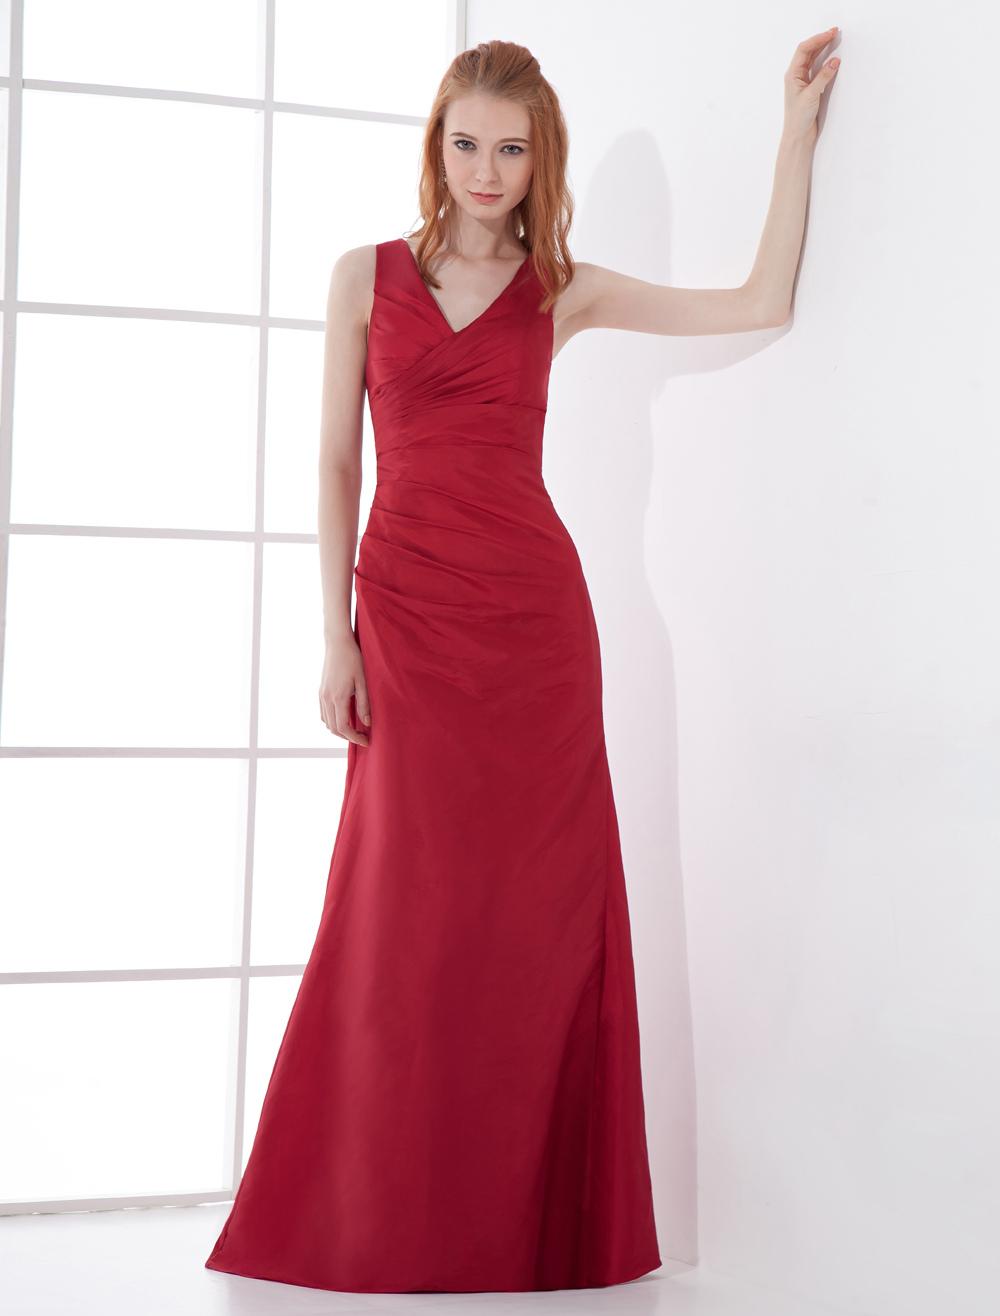 Sheath Burgundy Taffeta Zipper Floor-Length Bridesmaid Dress For Wedding